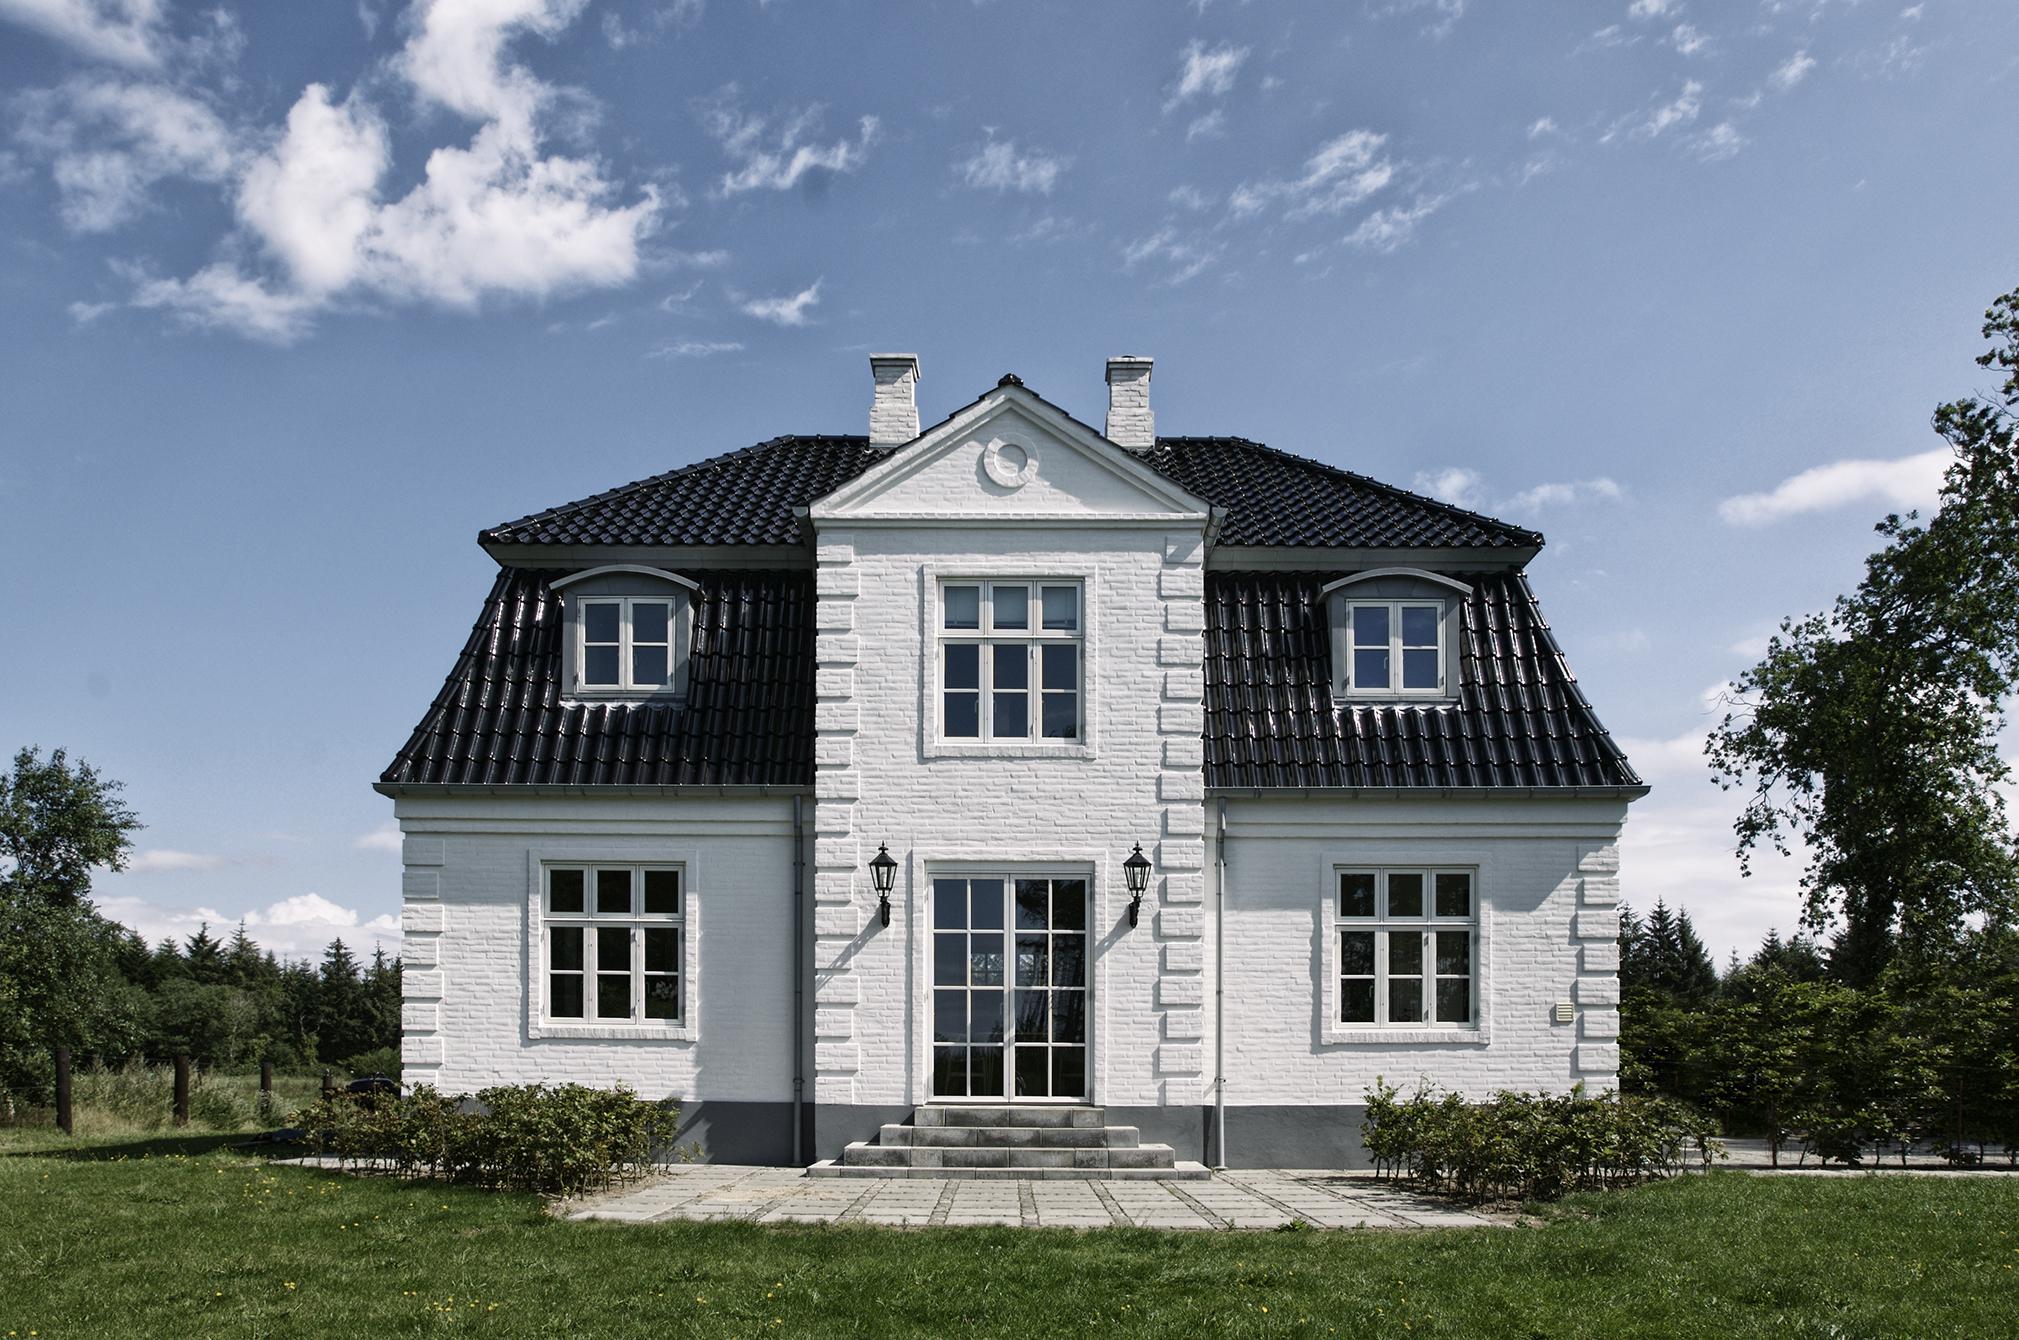 nye huse i gammel stil